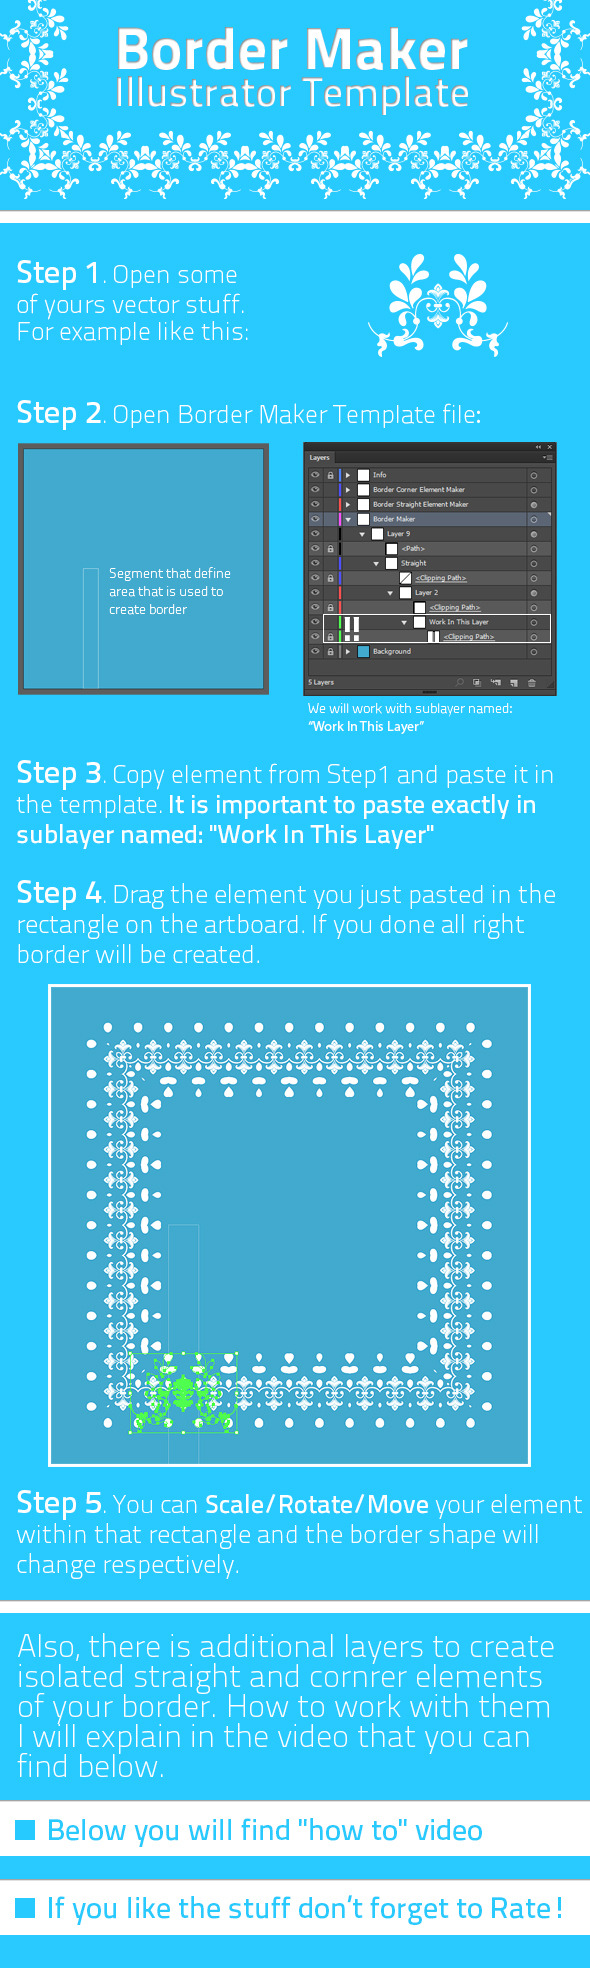 Border Maker Template - Actions Illustrator